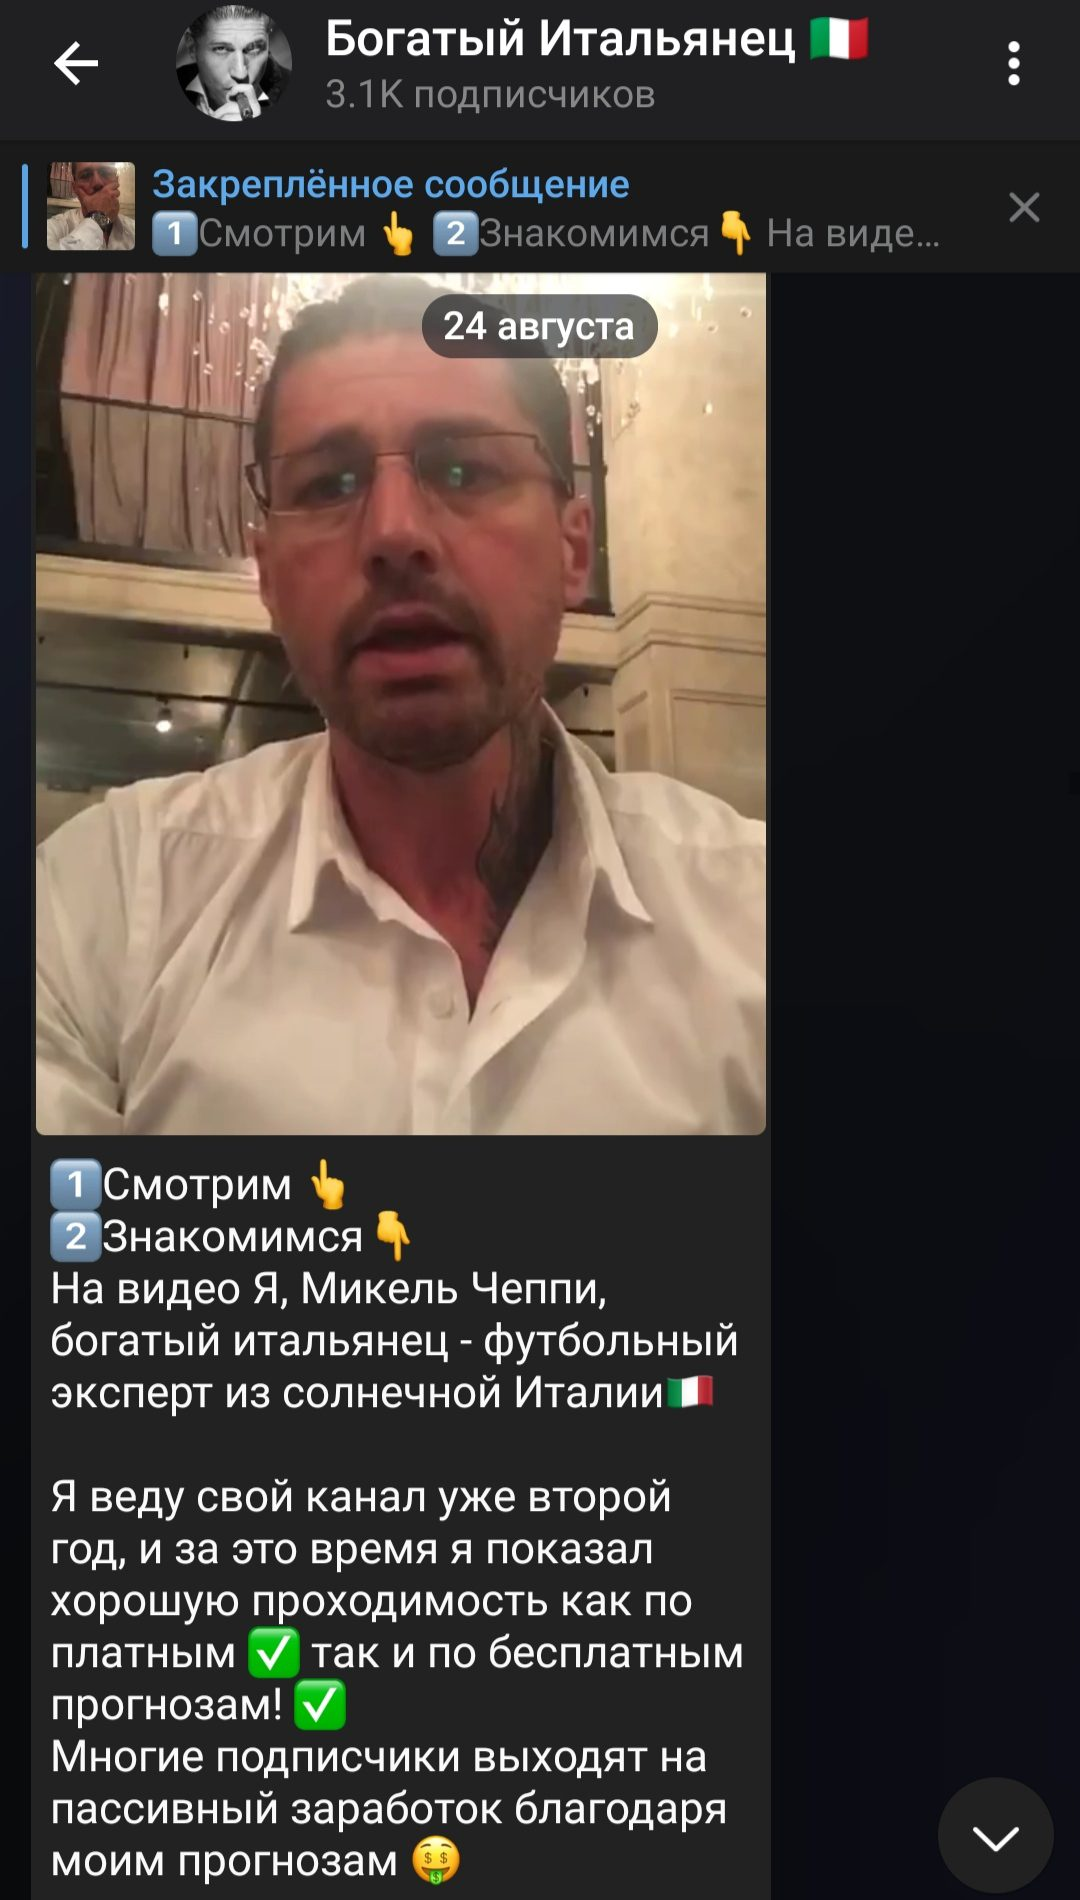 Богатый Итальянец Телеграмм